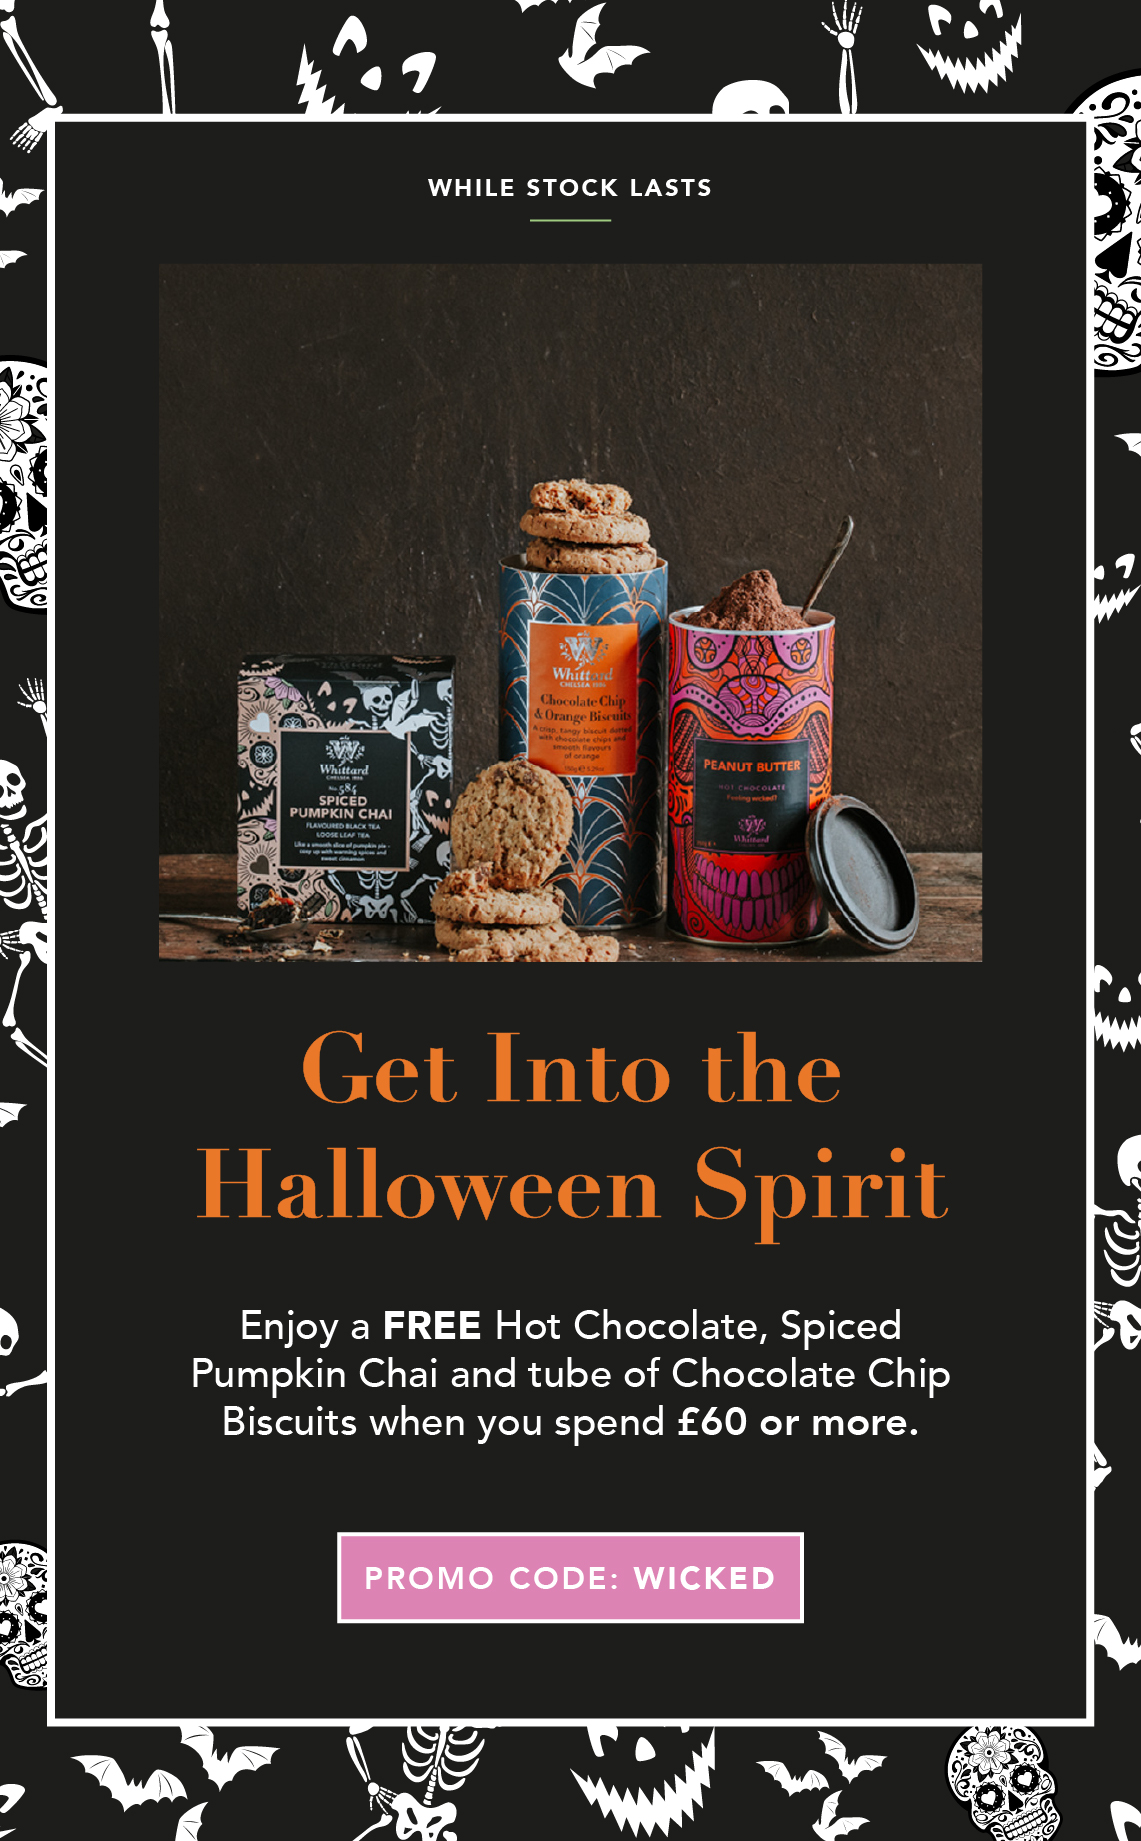 Get Into the Halloween Spirit